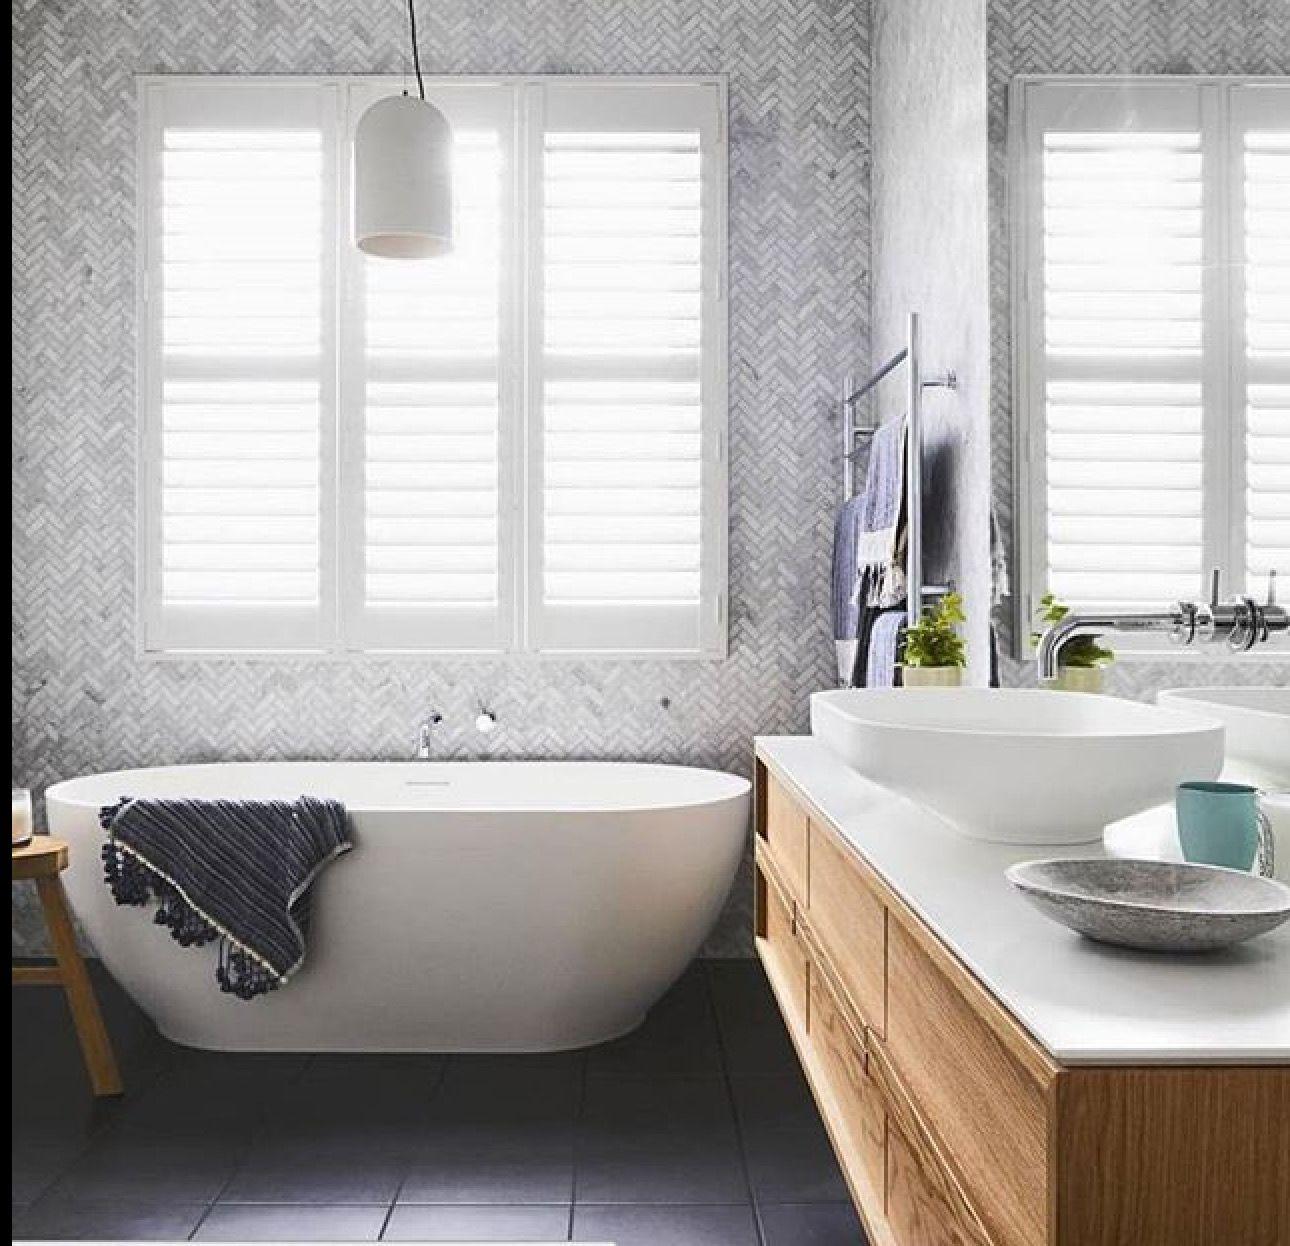 Pin by Helena Chinnock on Bathrooms | Pinterest